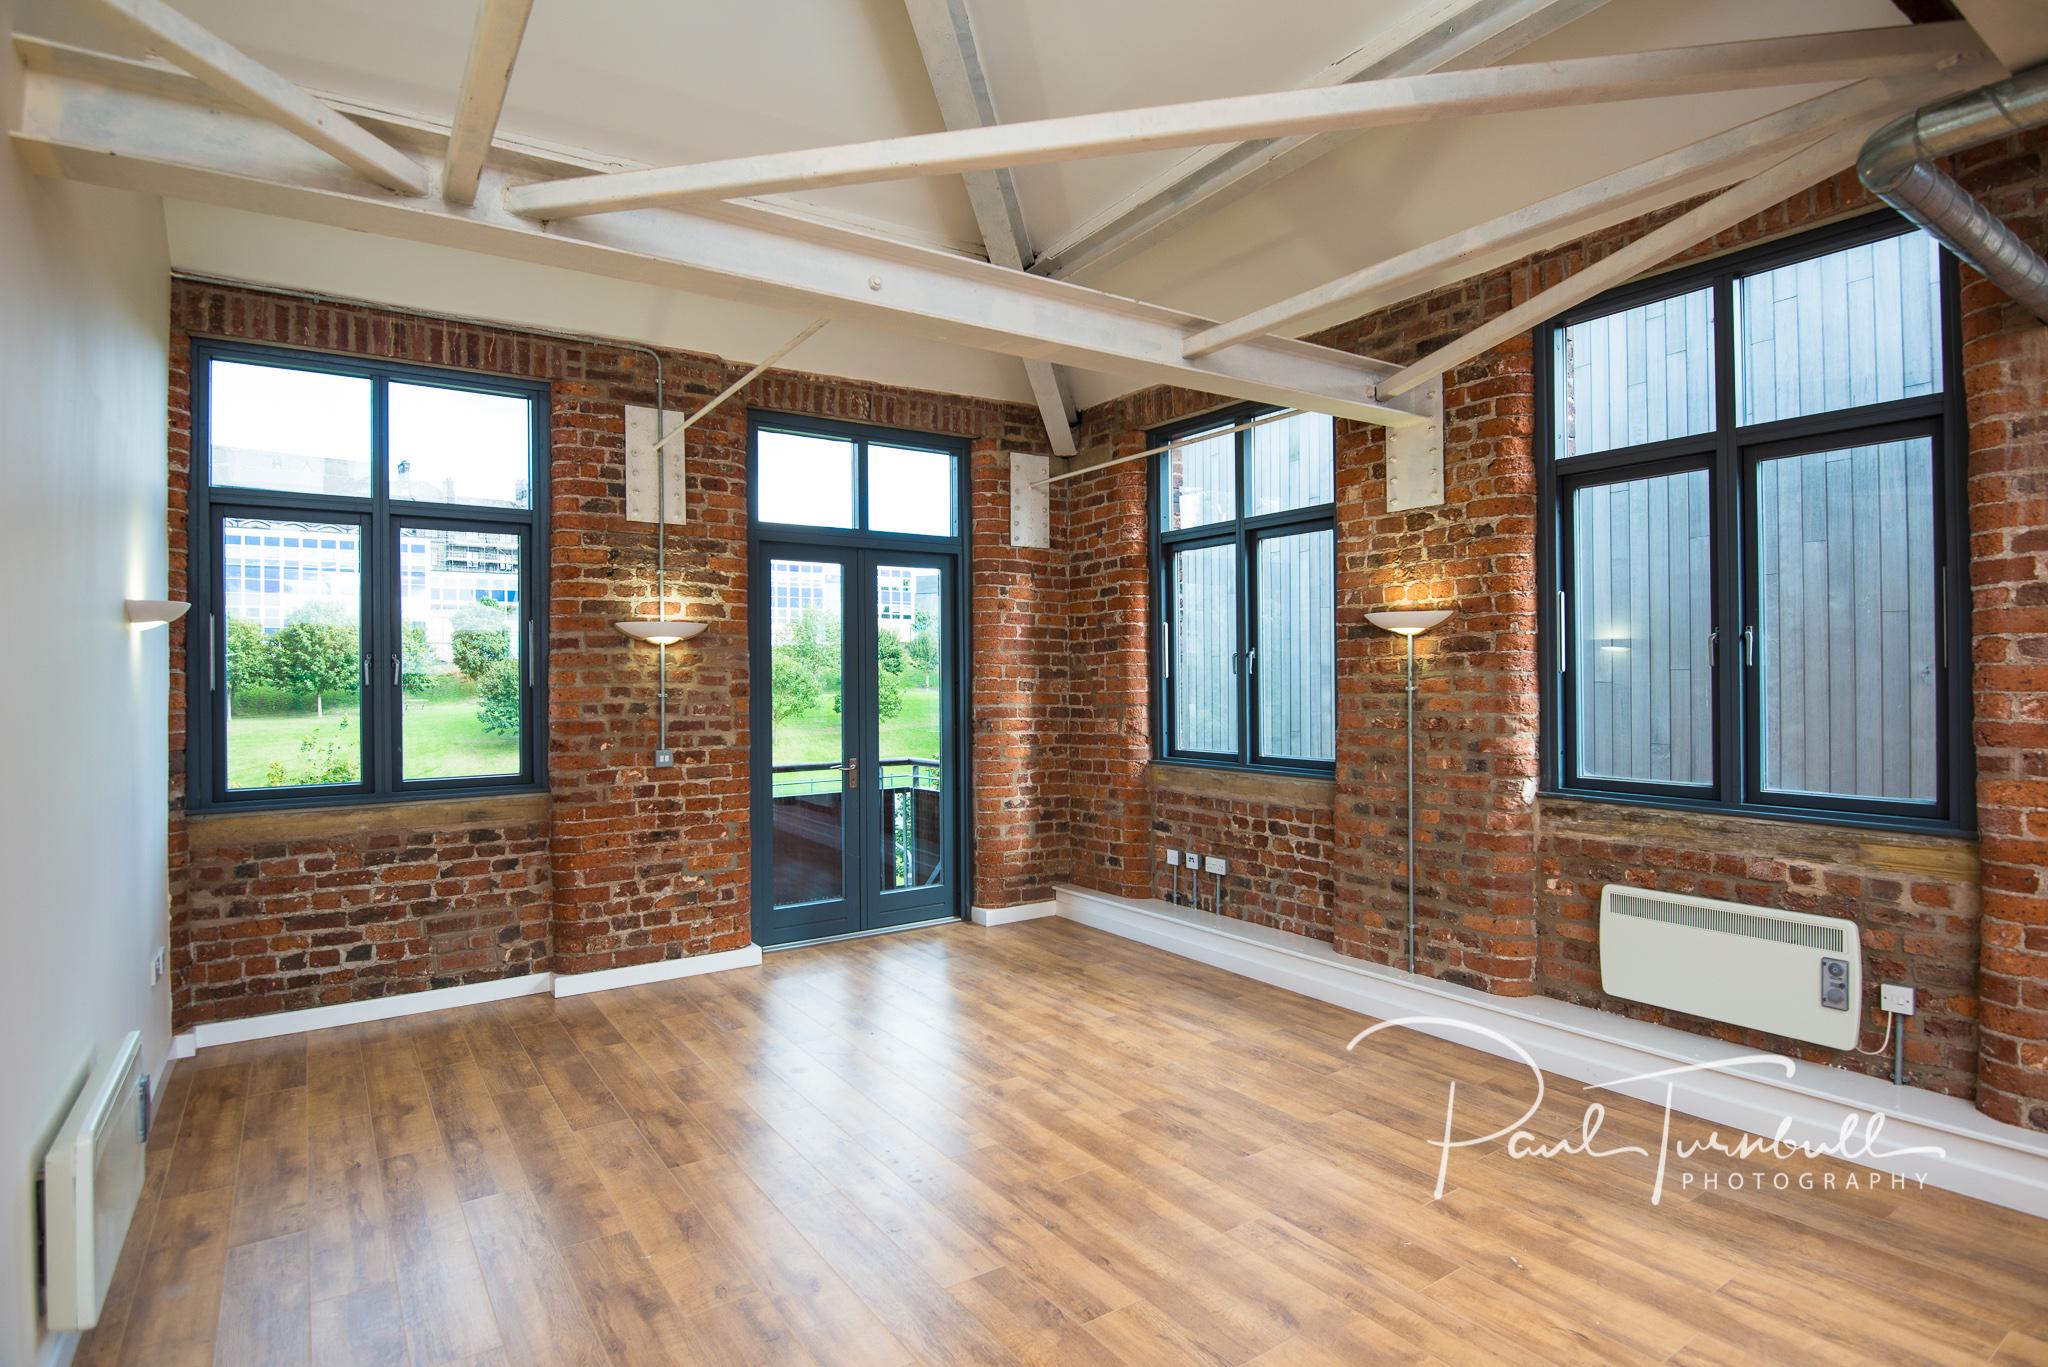 commercial-property-photographer-leeds-yorkshire-blackbrook-developments-034.jpg